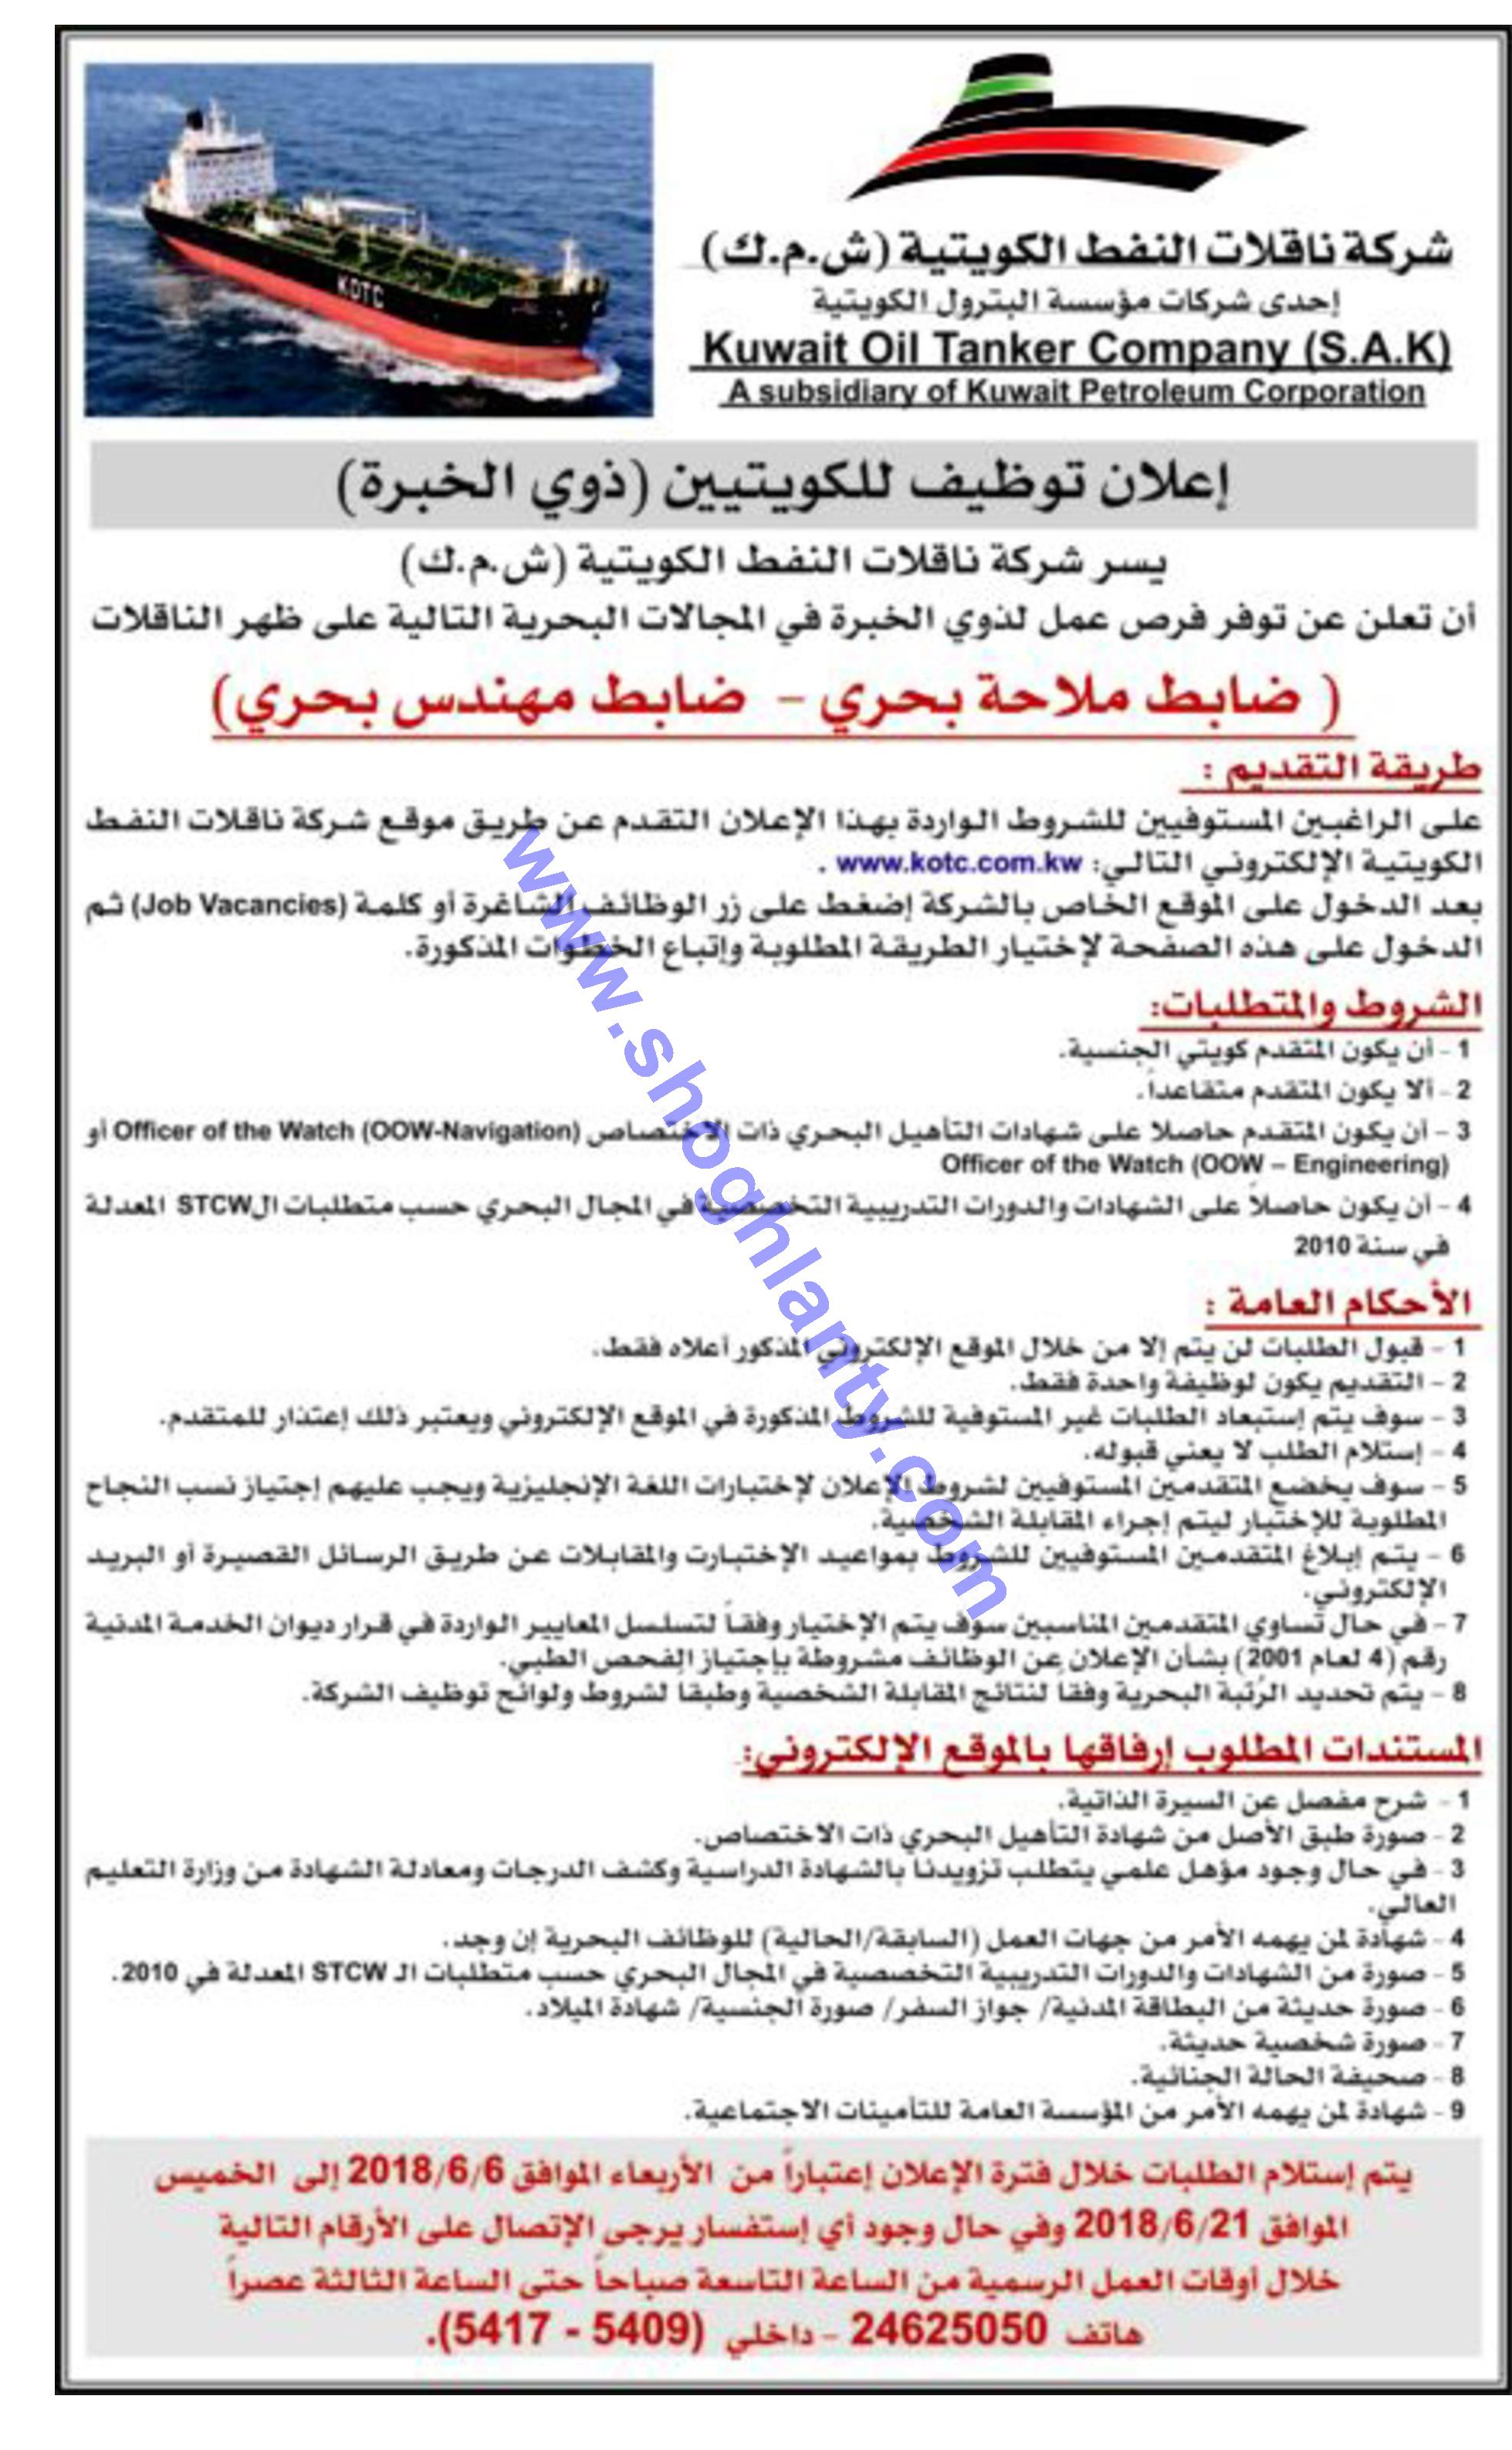 Jobs Navigation officer-Kuwait Oil Tanker Company - Kuwait-Kuwai